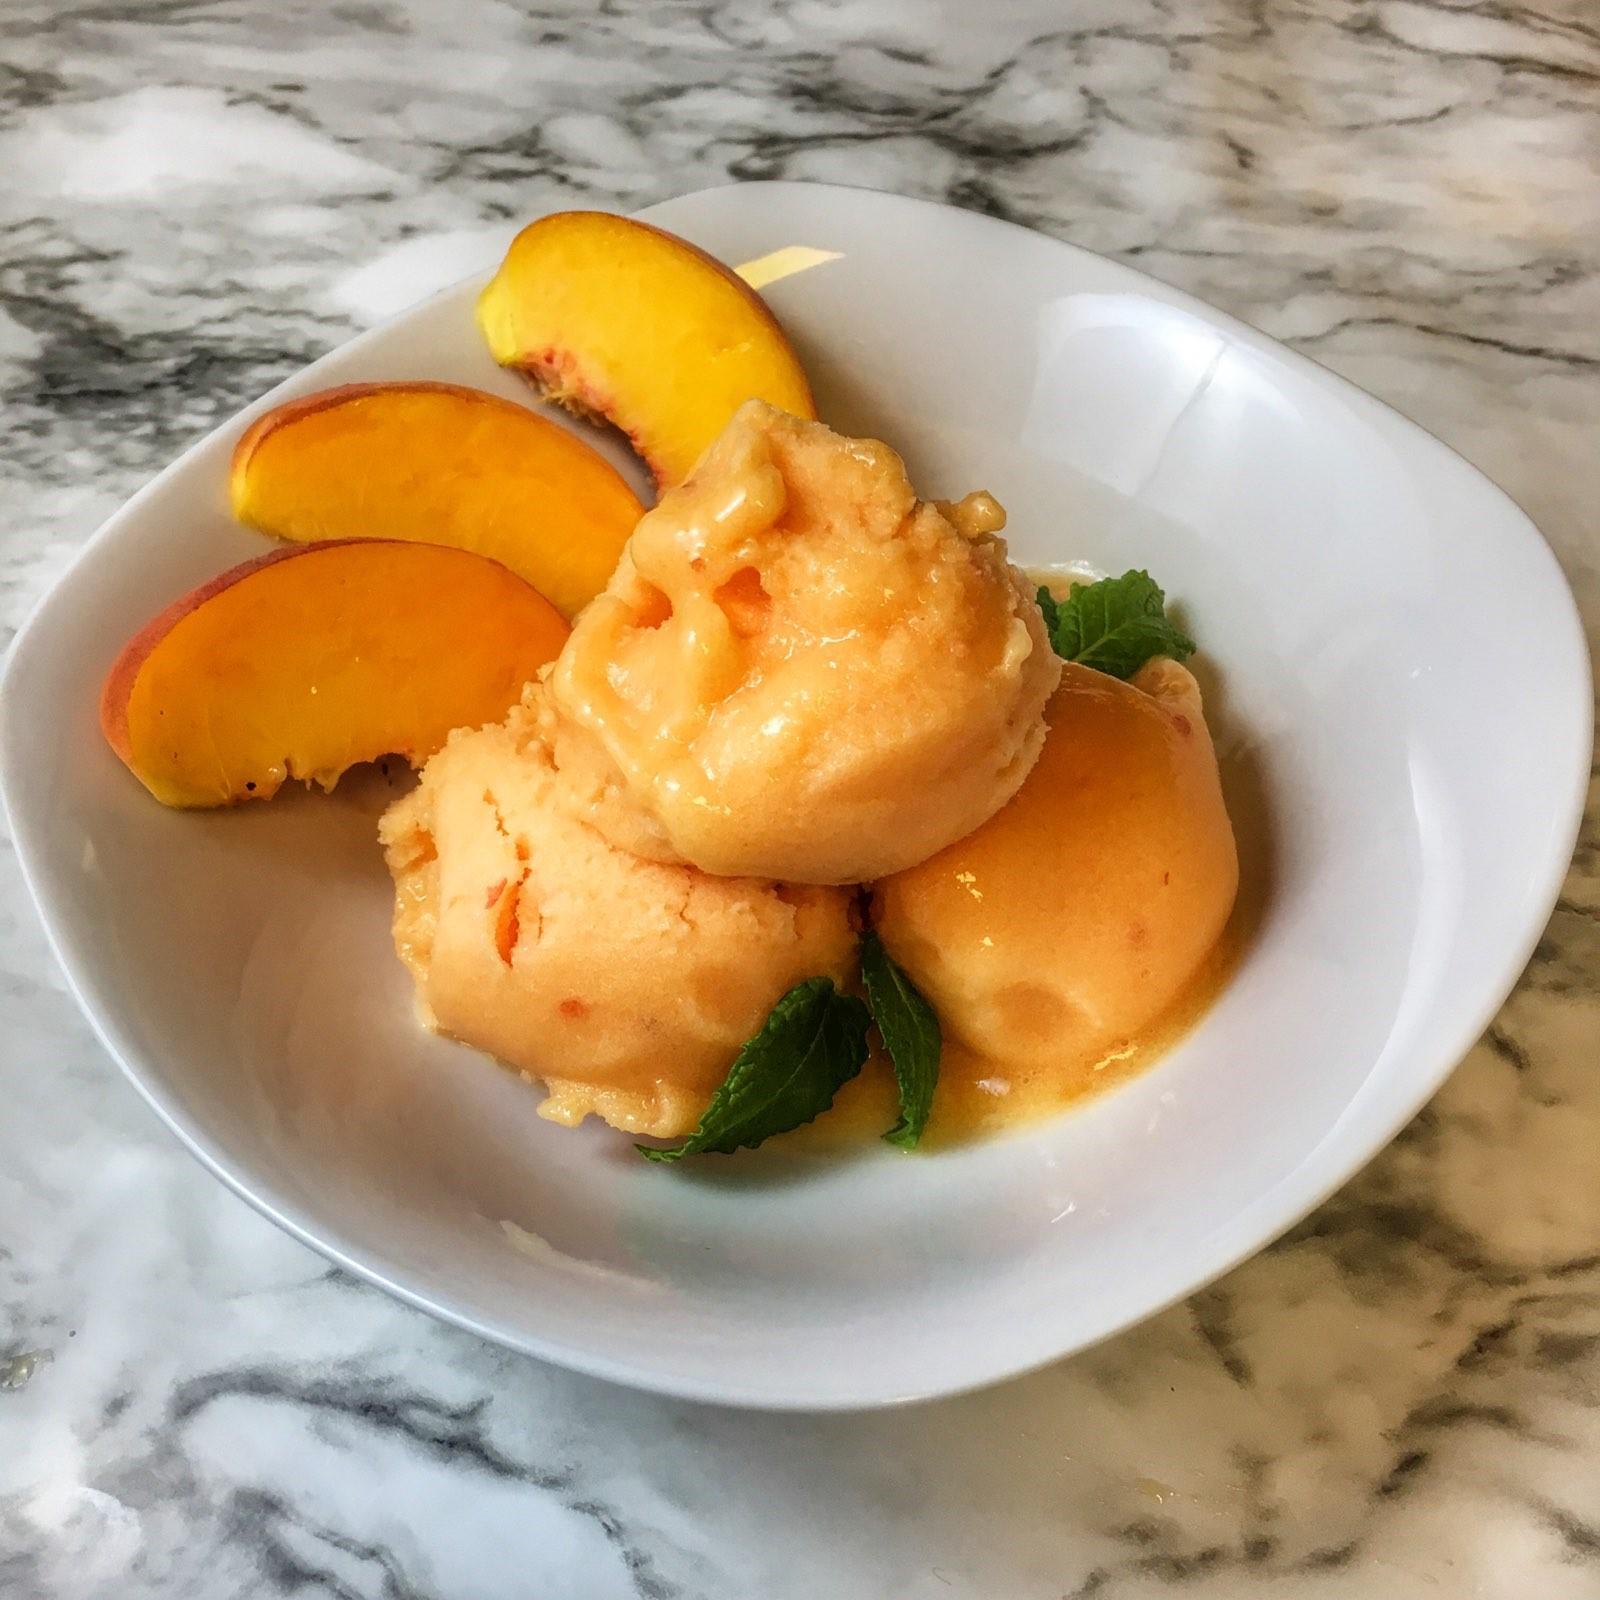 Homemade Peach Sorbet